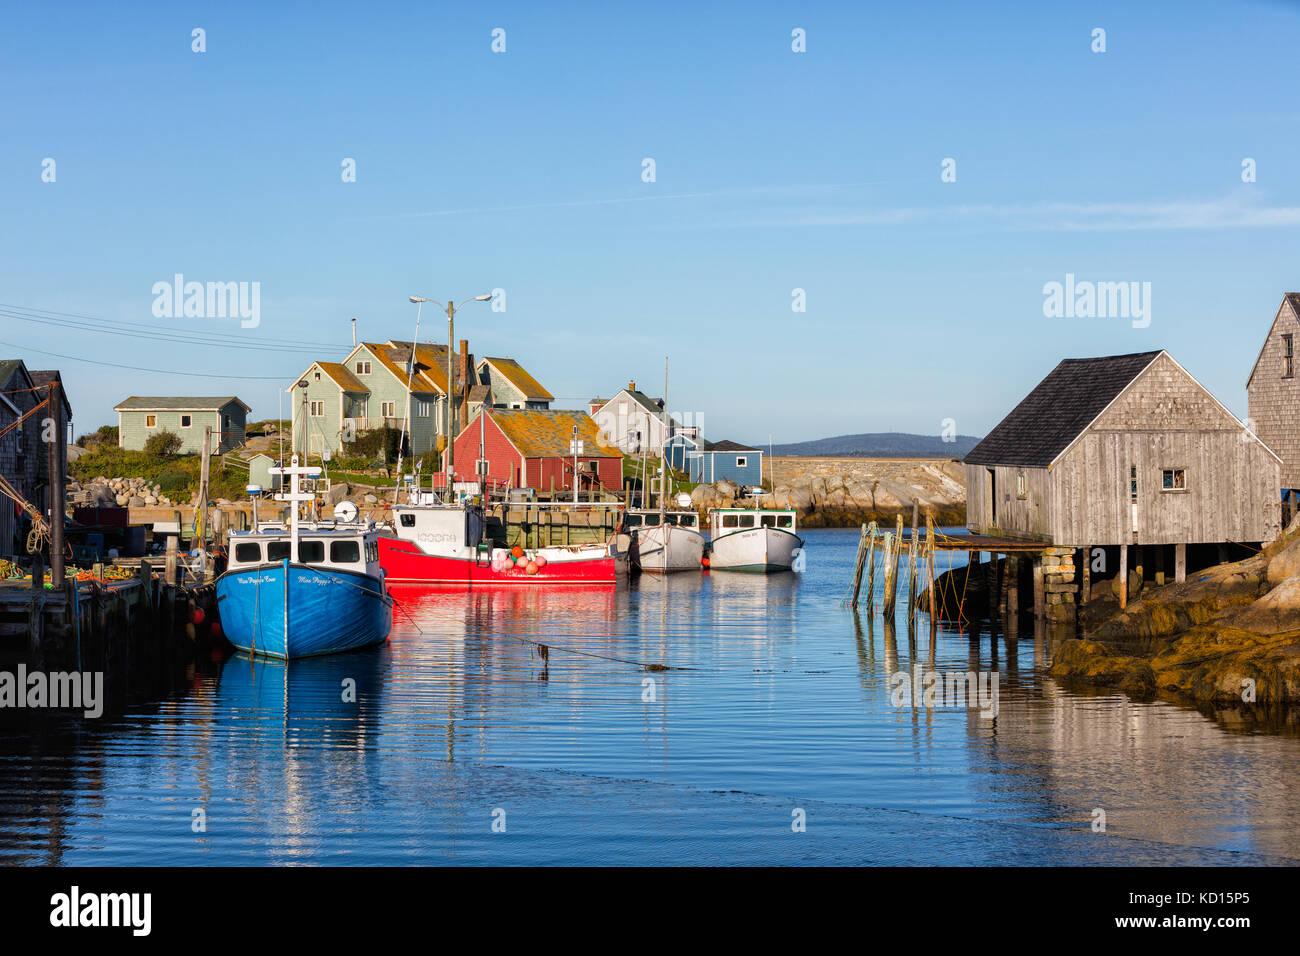 Fishing boats tied up at wharf, Peggys Cove, Nova Scotia - Stock Image